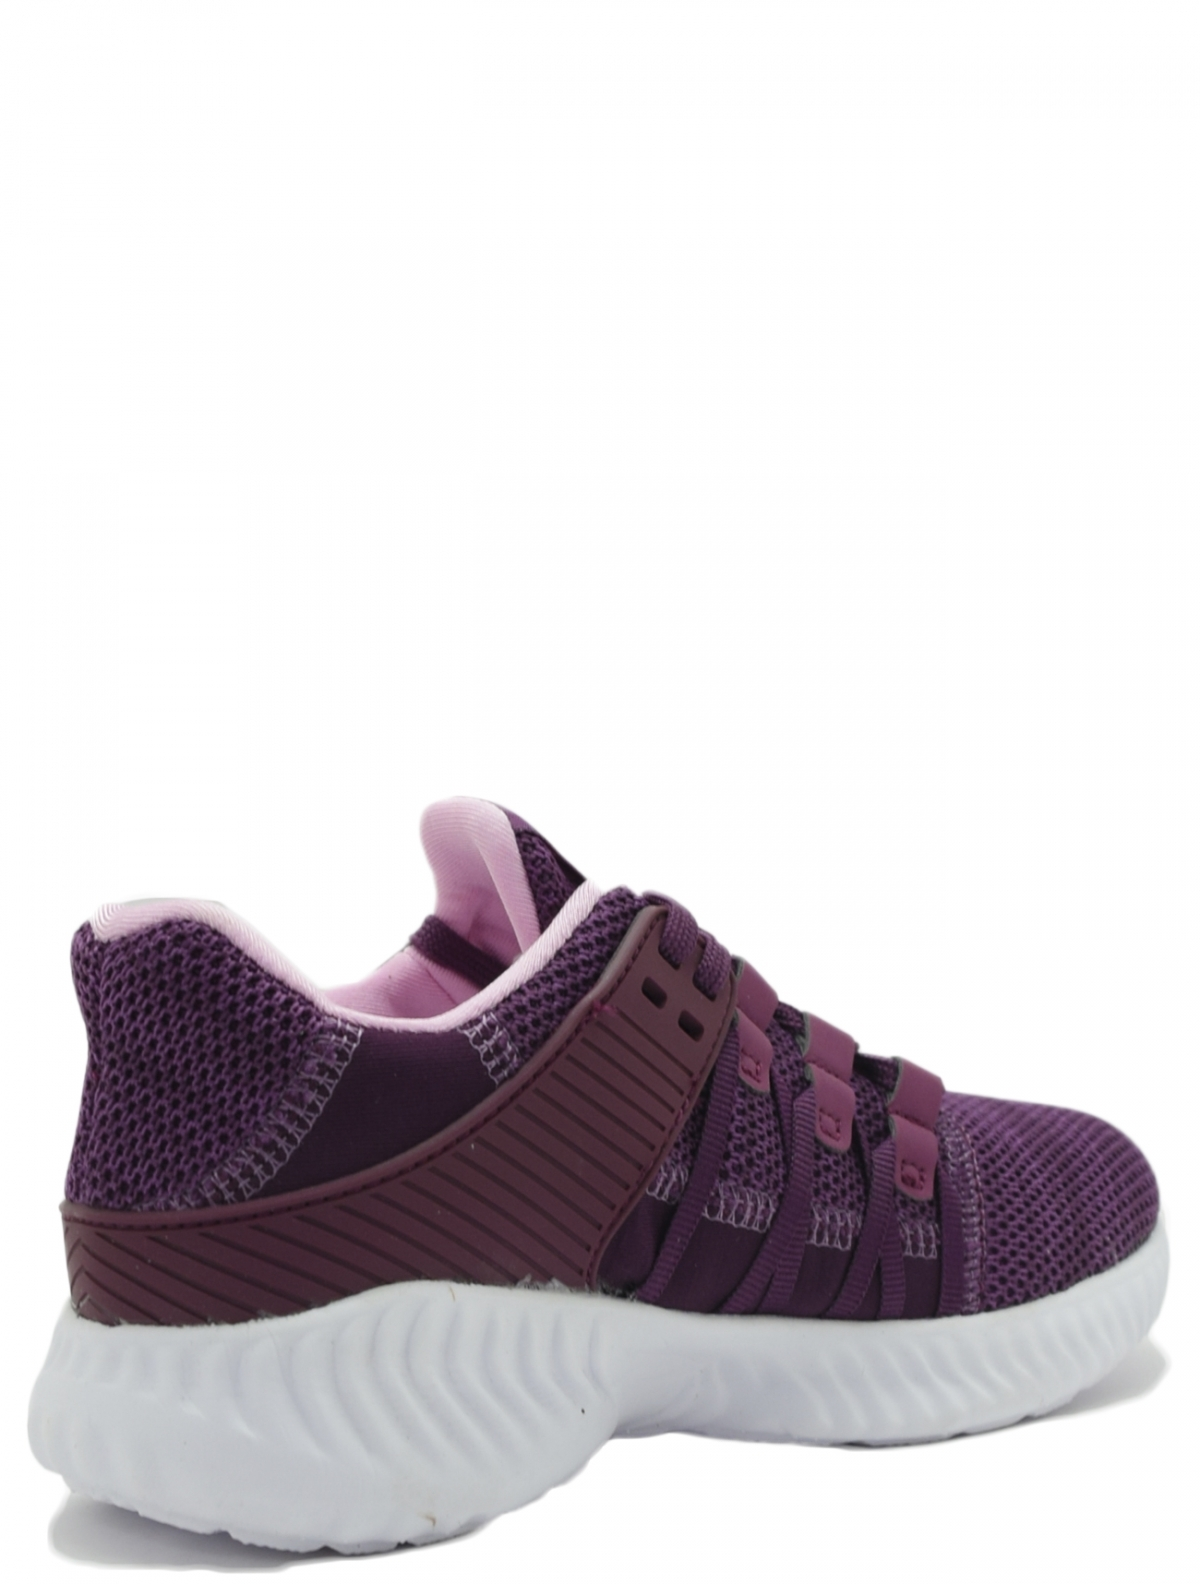 Mursu 215462 кроссовки для девочки